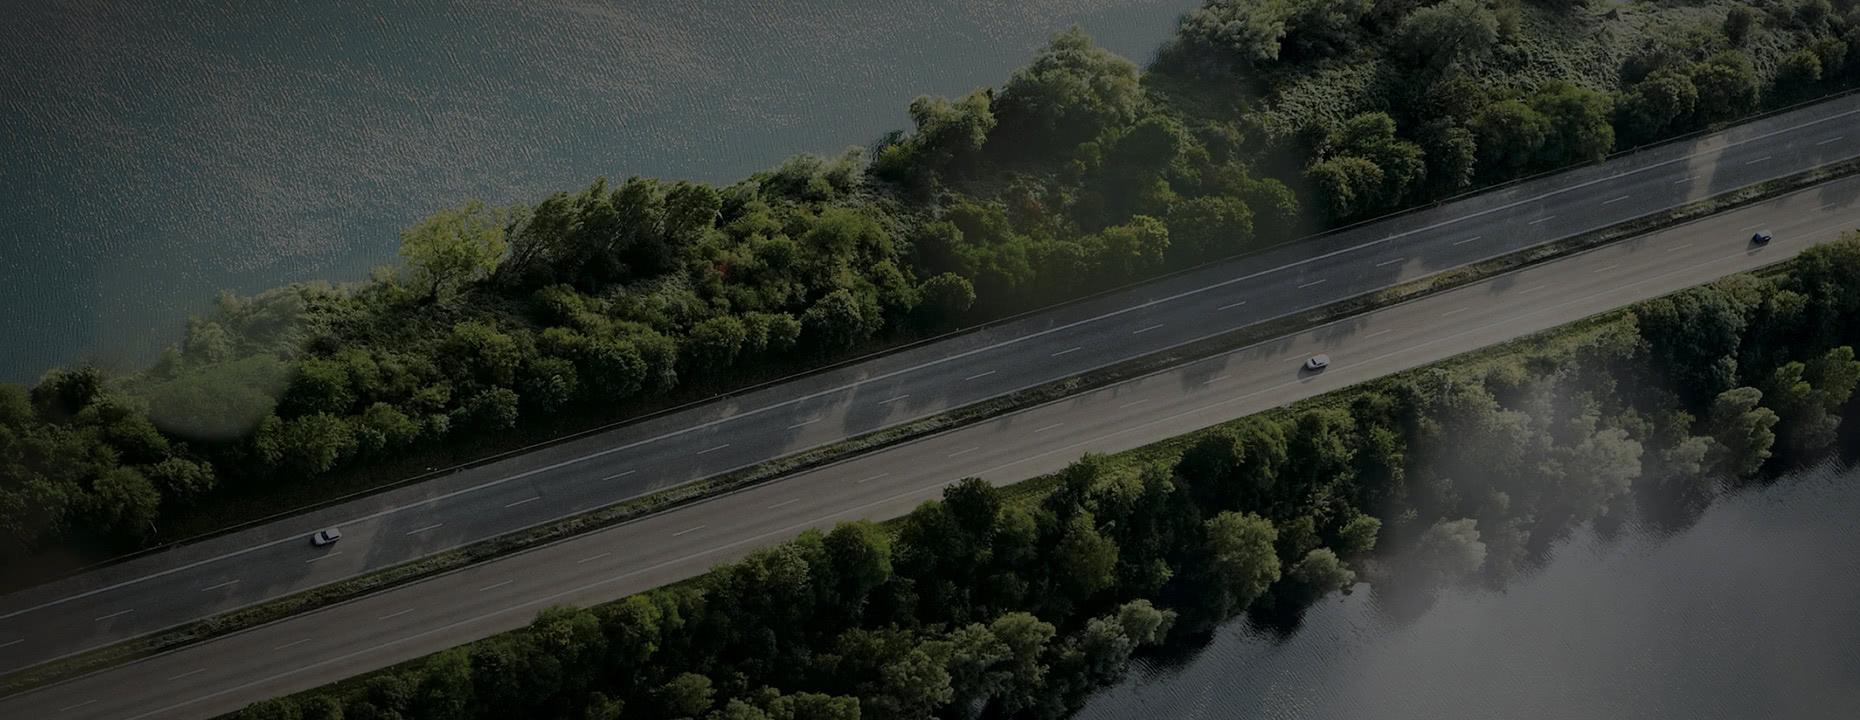 Поради з автостради #2 | Богдан-Авто Житомир - фото 7